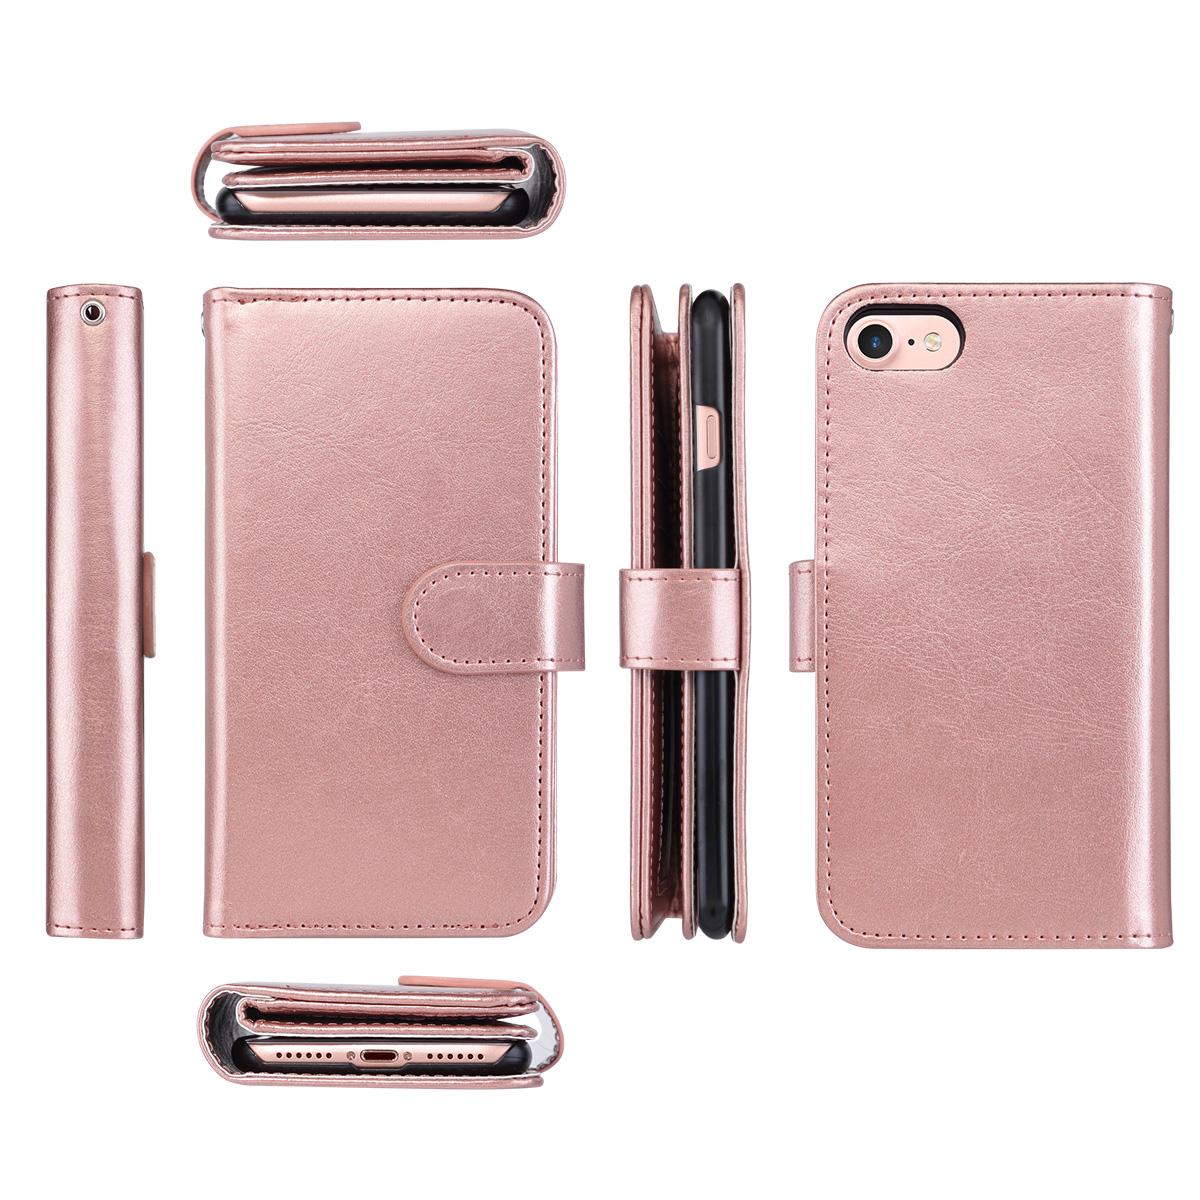 iphone 7 case pocket